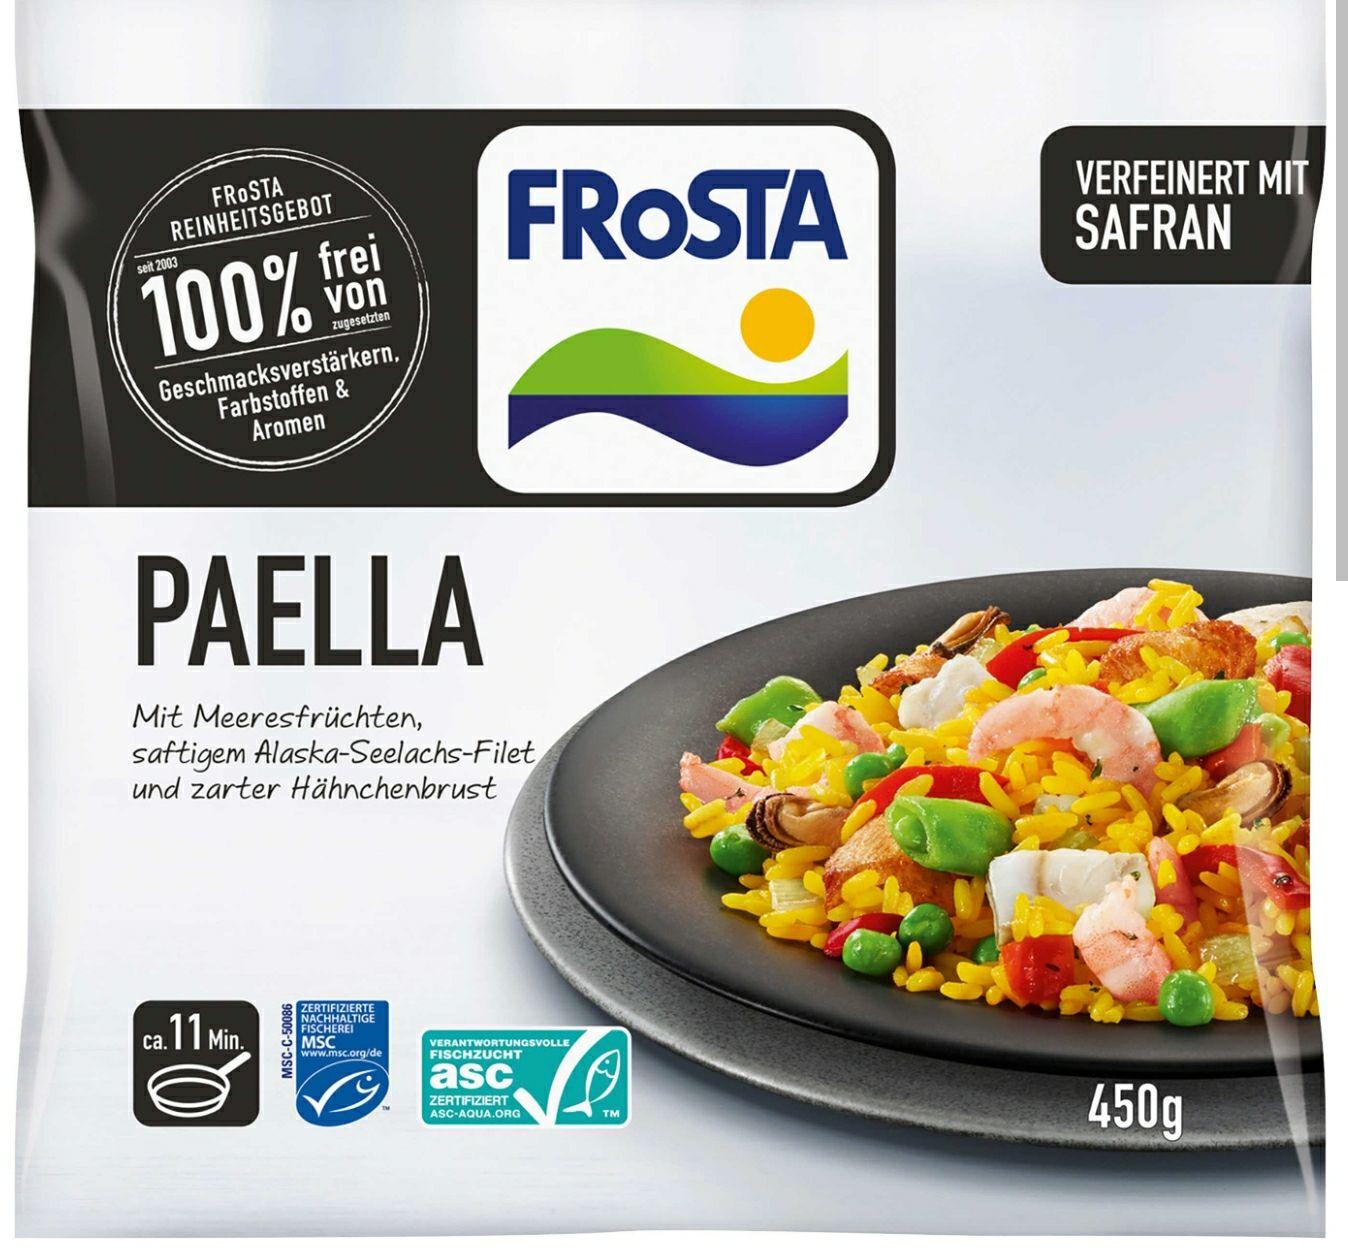 Sammeldeal: Frosta Fertiggerichte versch. Sorten 2,49€ | Schoko Donut 0,33€ | Cashew-Erdnuss-Mix 1,69€ [Kaufland ab 04.06.]